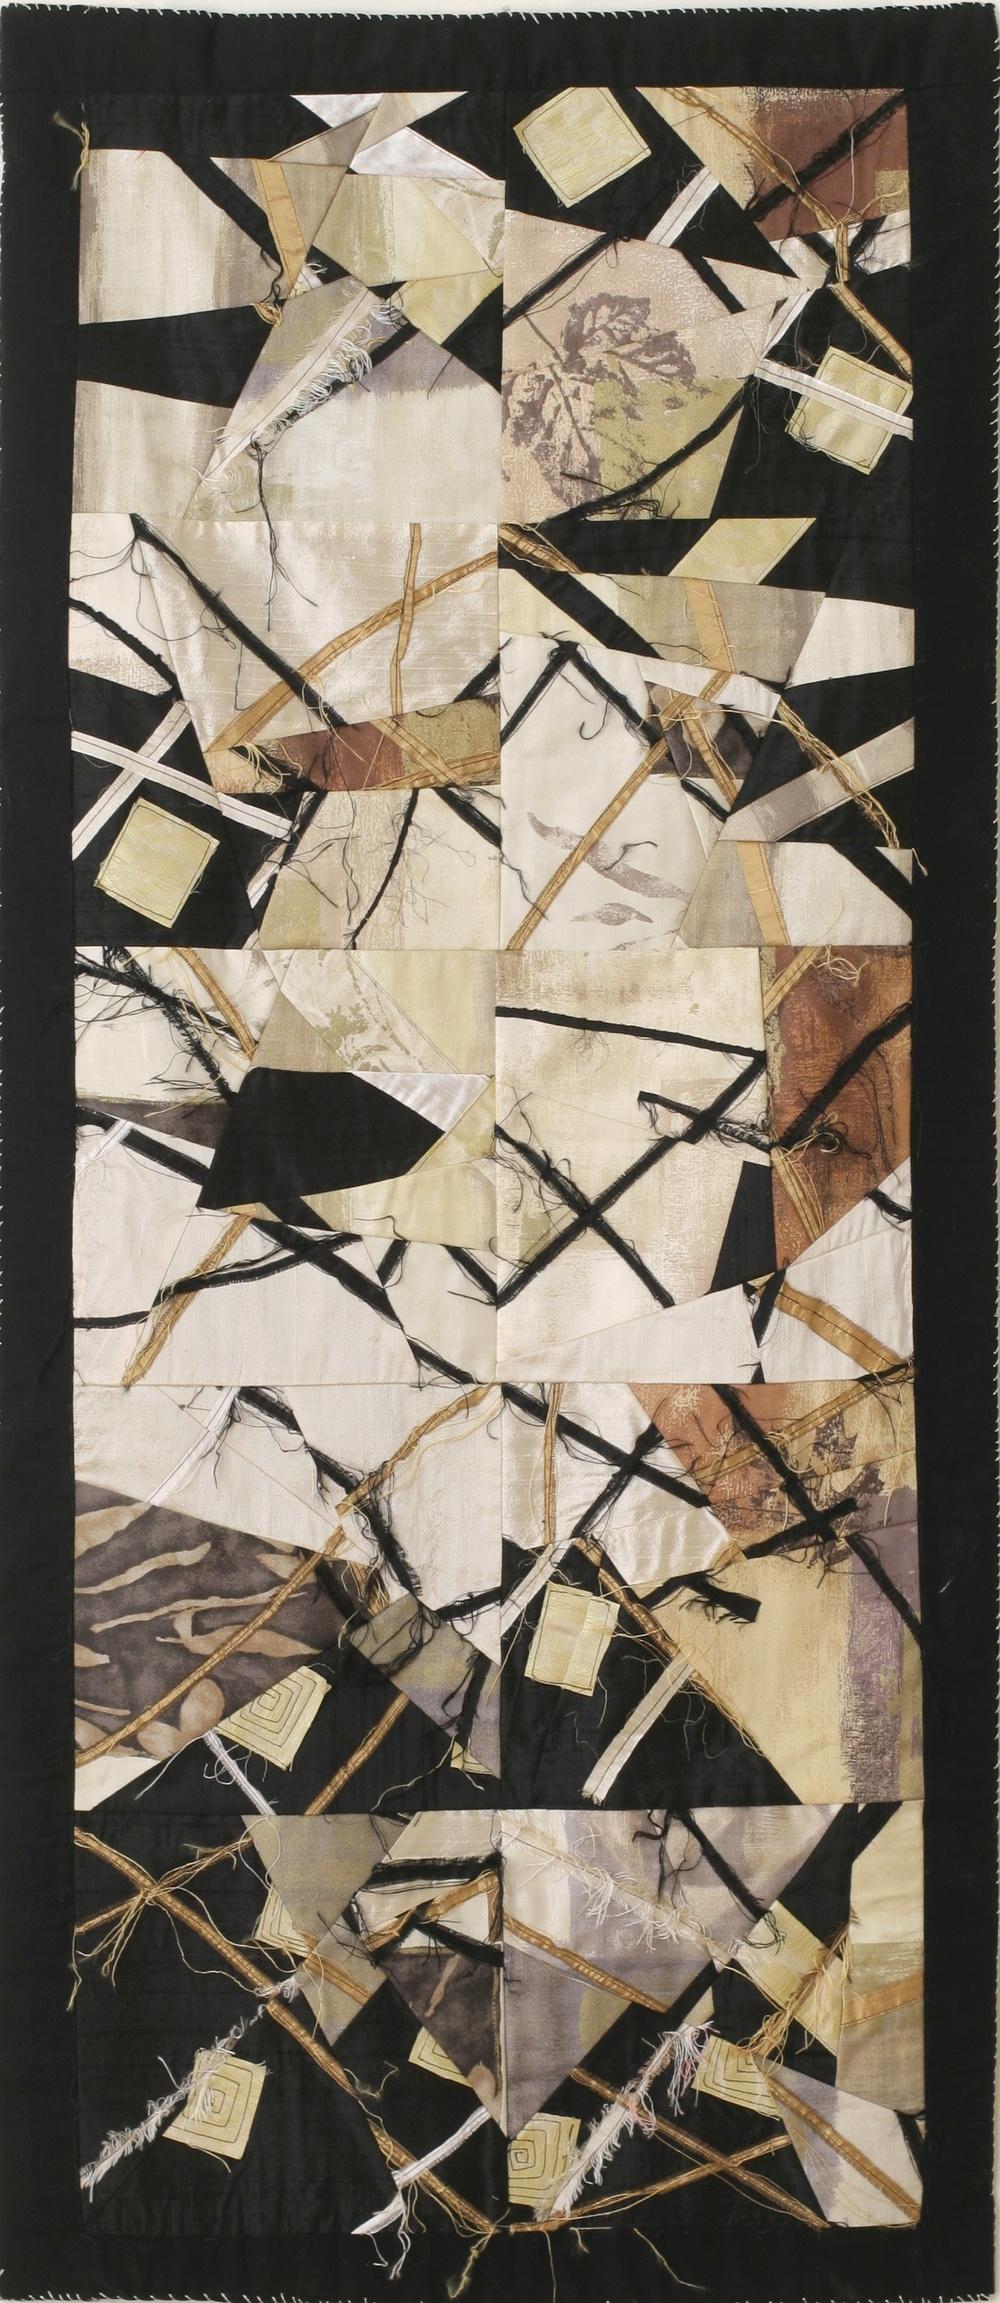 """First Winter in Beacon:"" Salvaged upholstery fabric and silk by Shelita Birchett Benash, 2004."